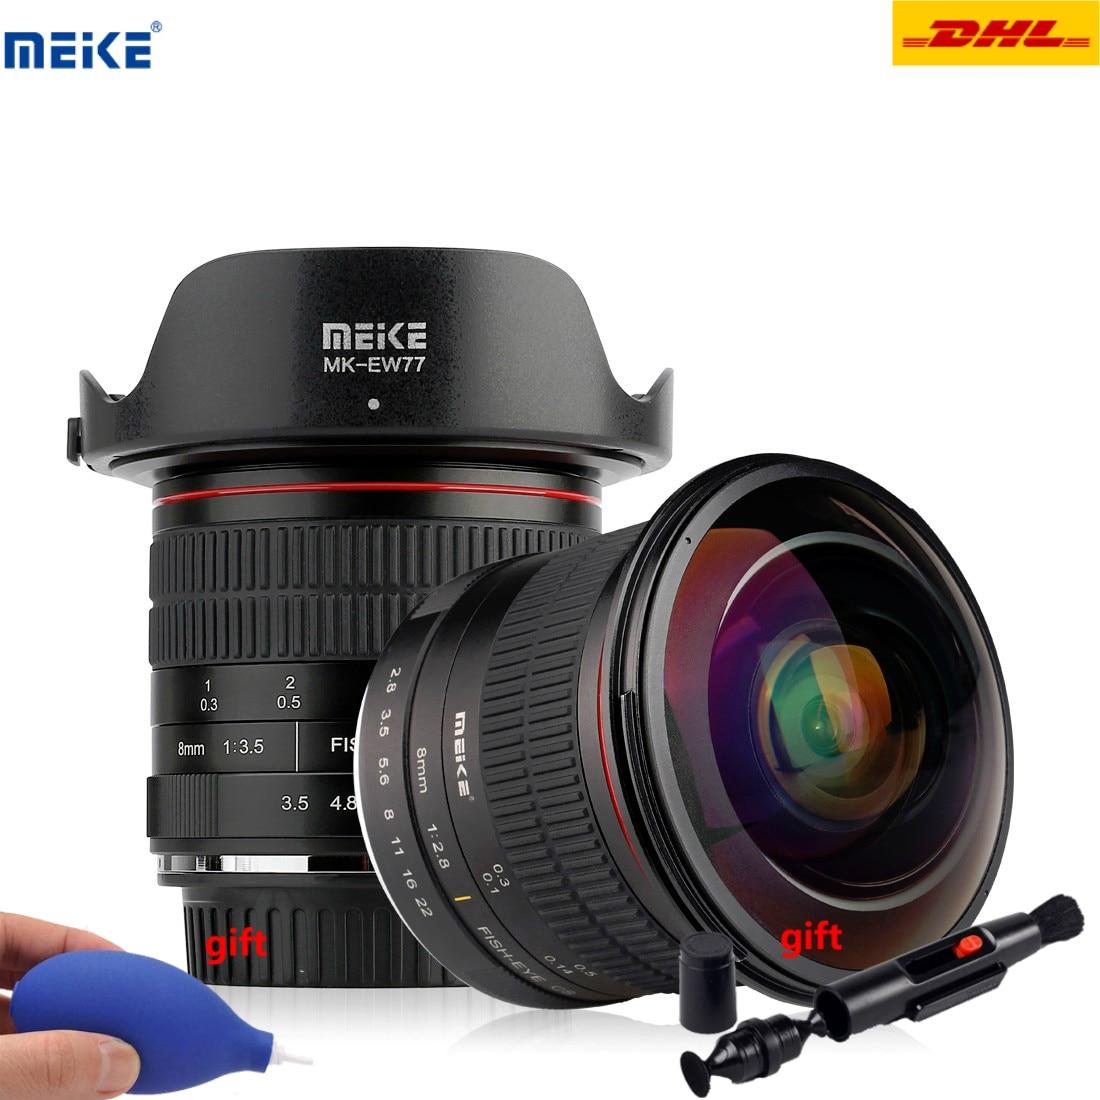 Meike 12mm F2.8 Ultra Wide Angle Manual Fixed Lens for Olympus Micro 4/3 EM10 Mark Ii EM5 EM1 EP5 EPL3 Panasonic Lumix G7 Lenses